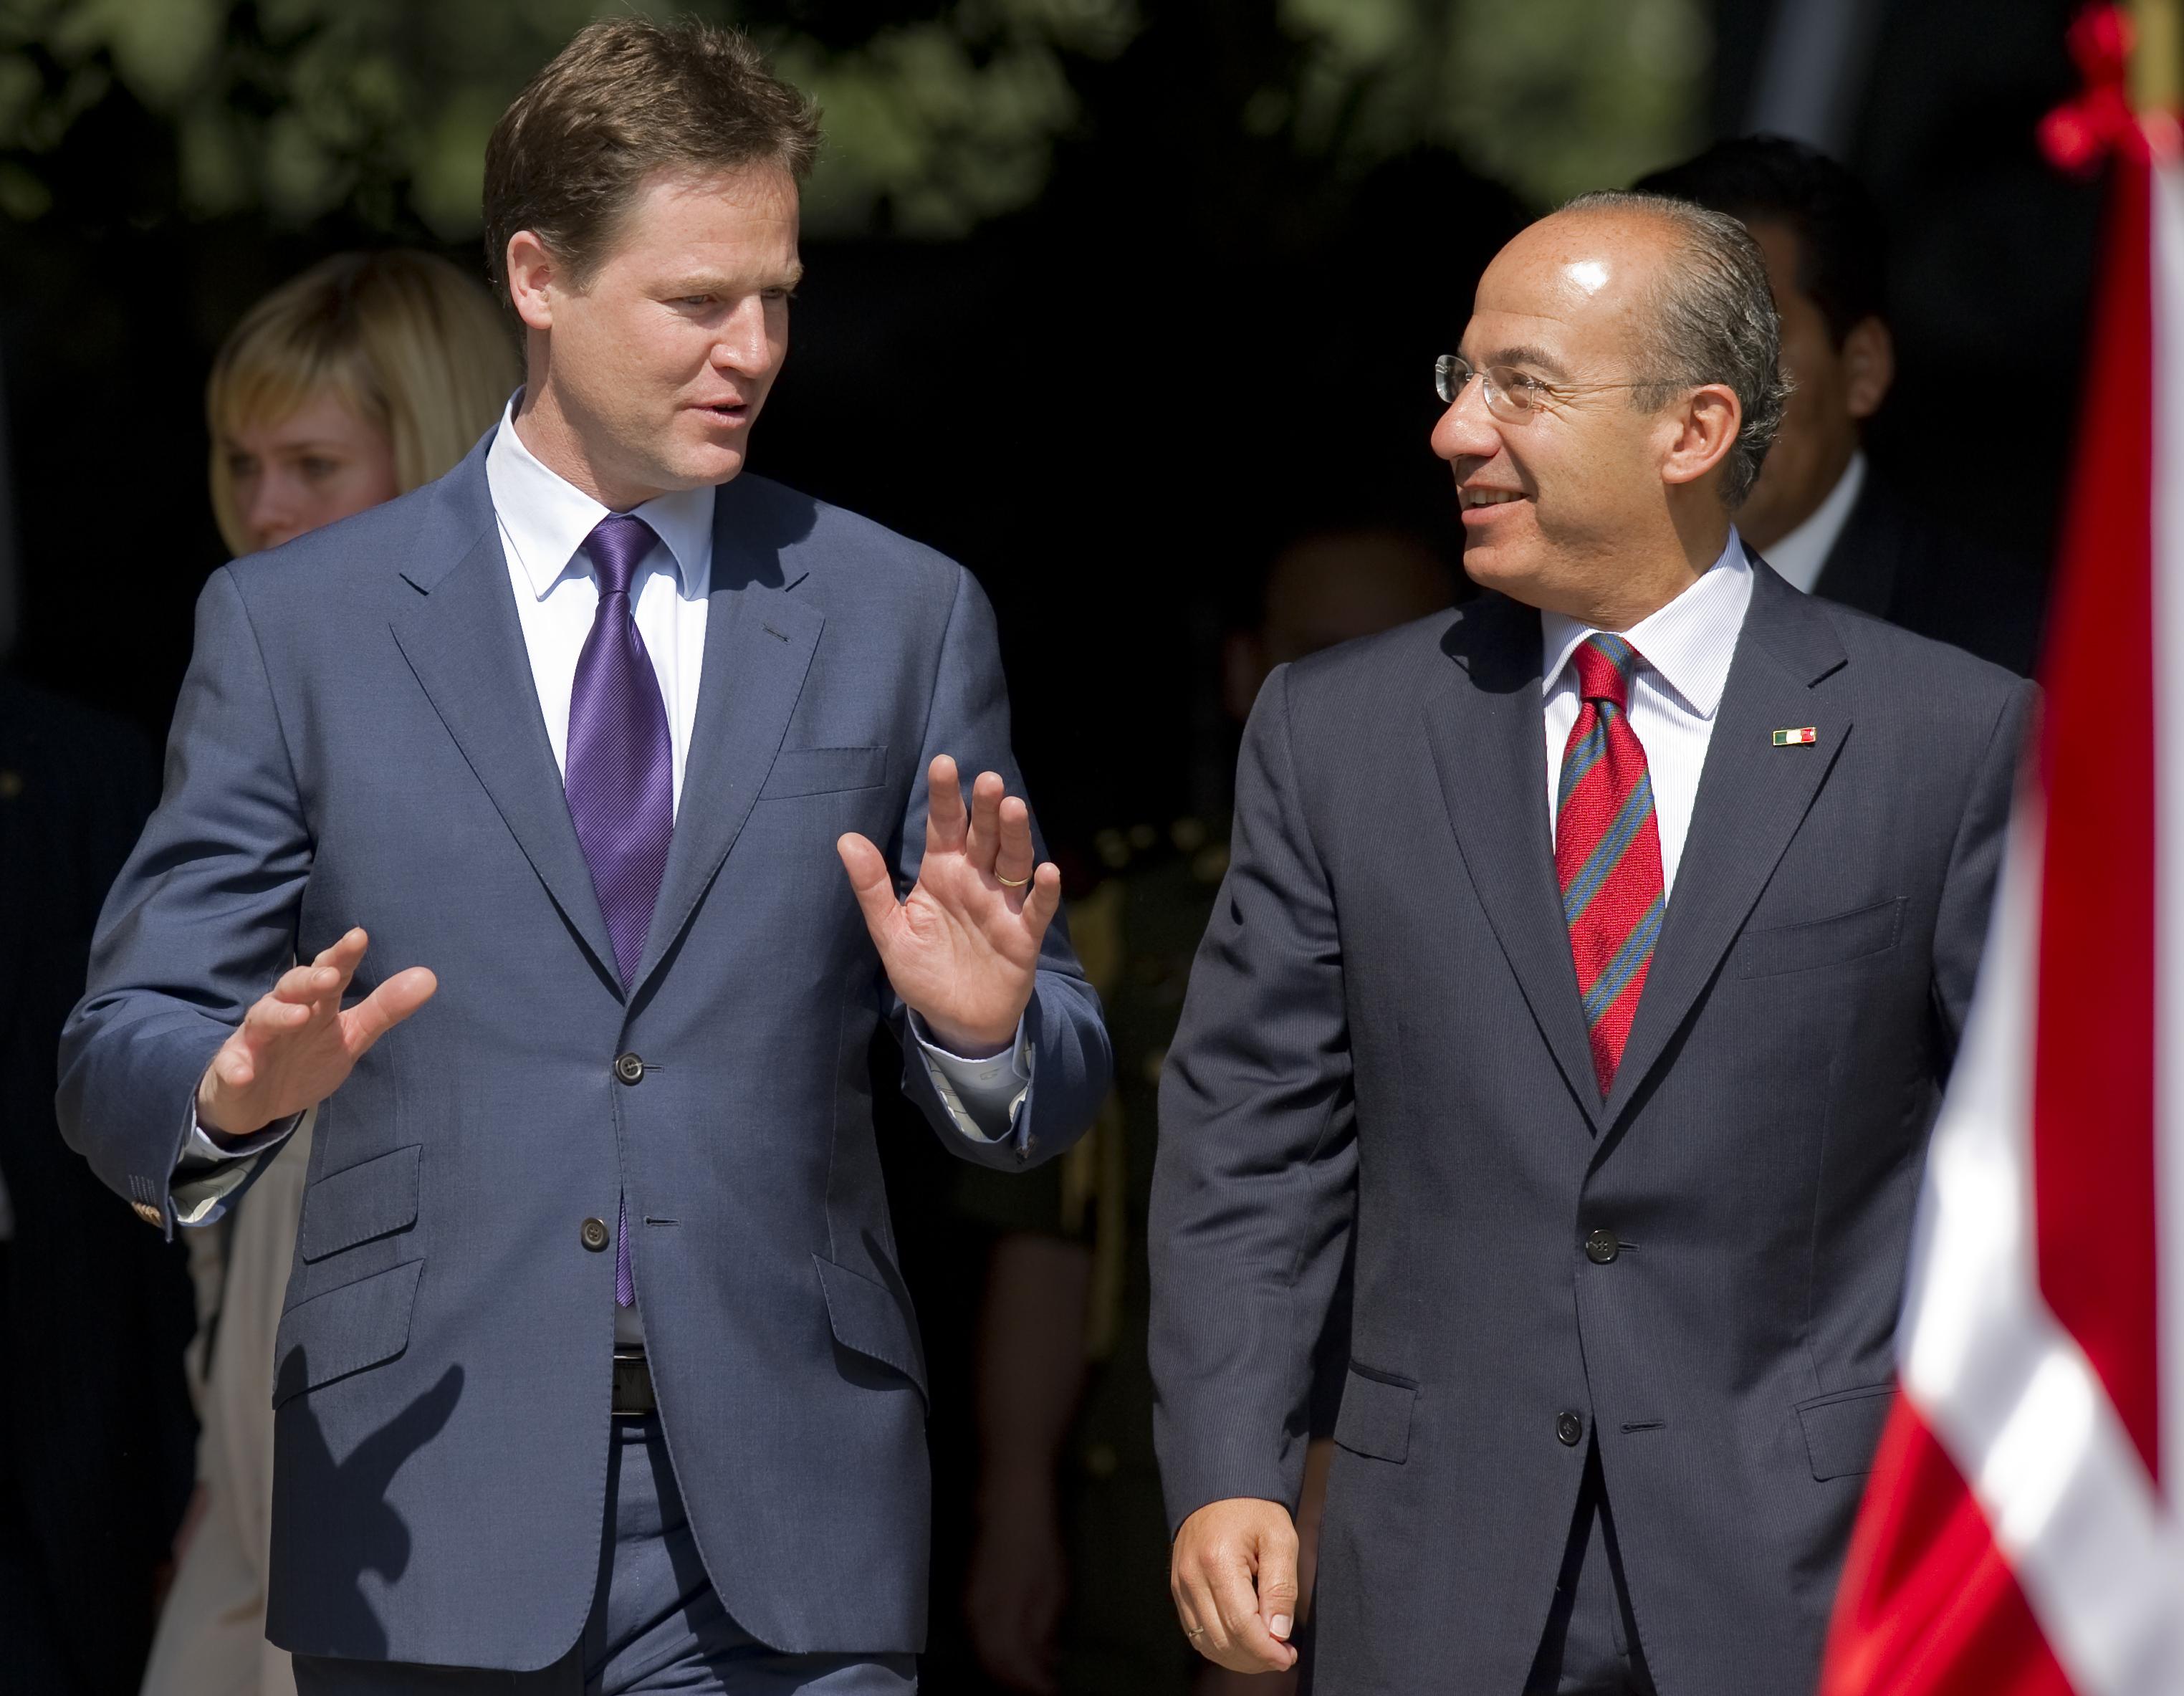 British Deputy Prime Minister Nick Clegg and Mexican President Felipe Calderon